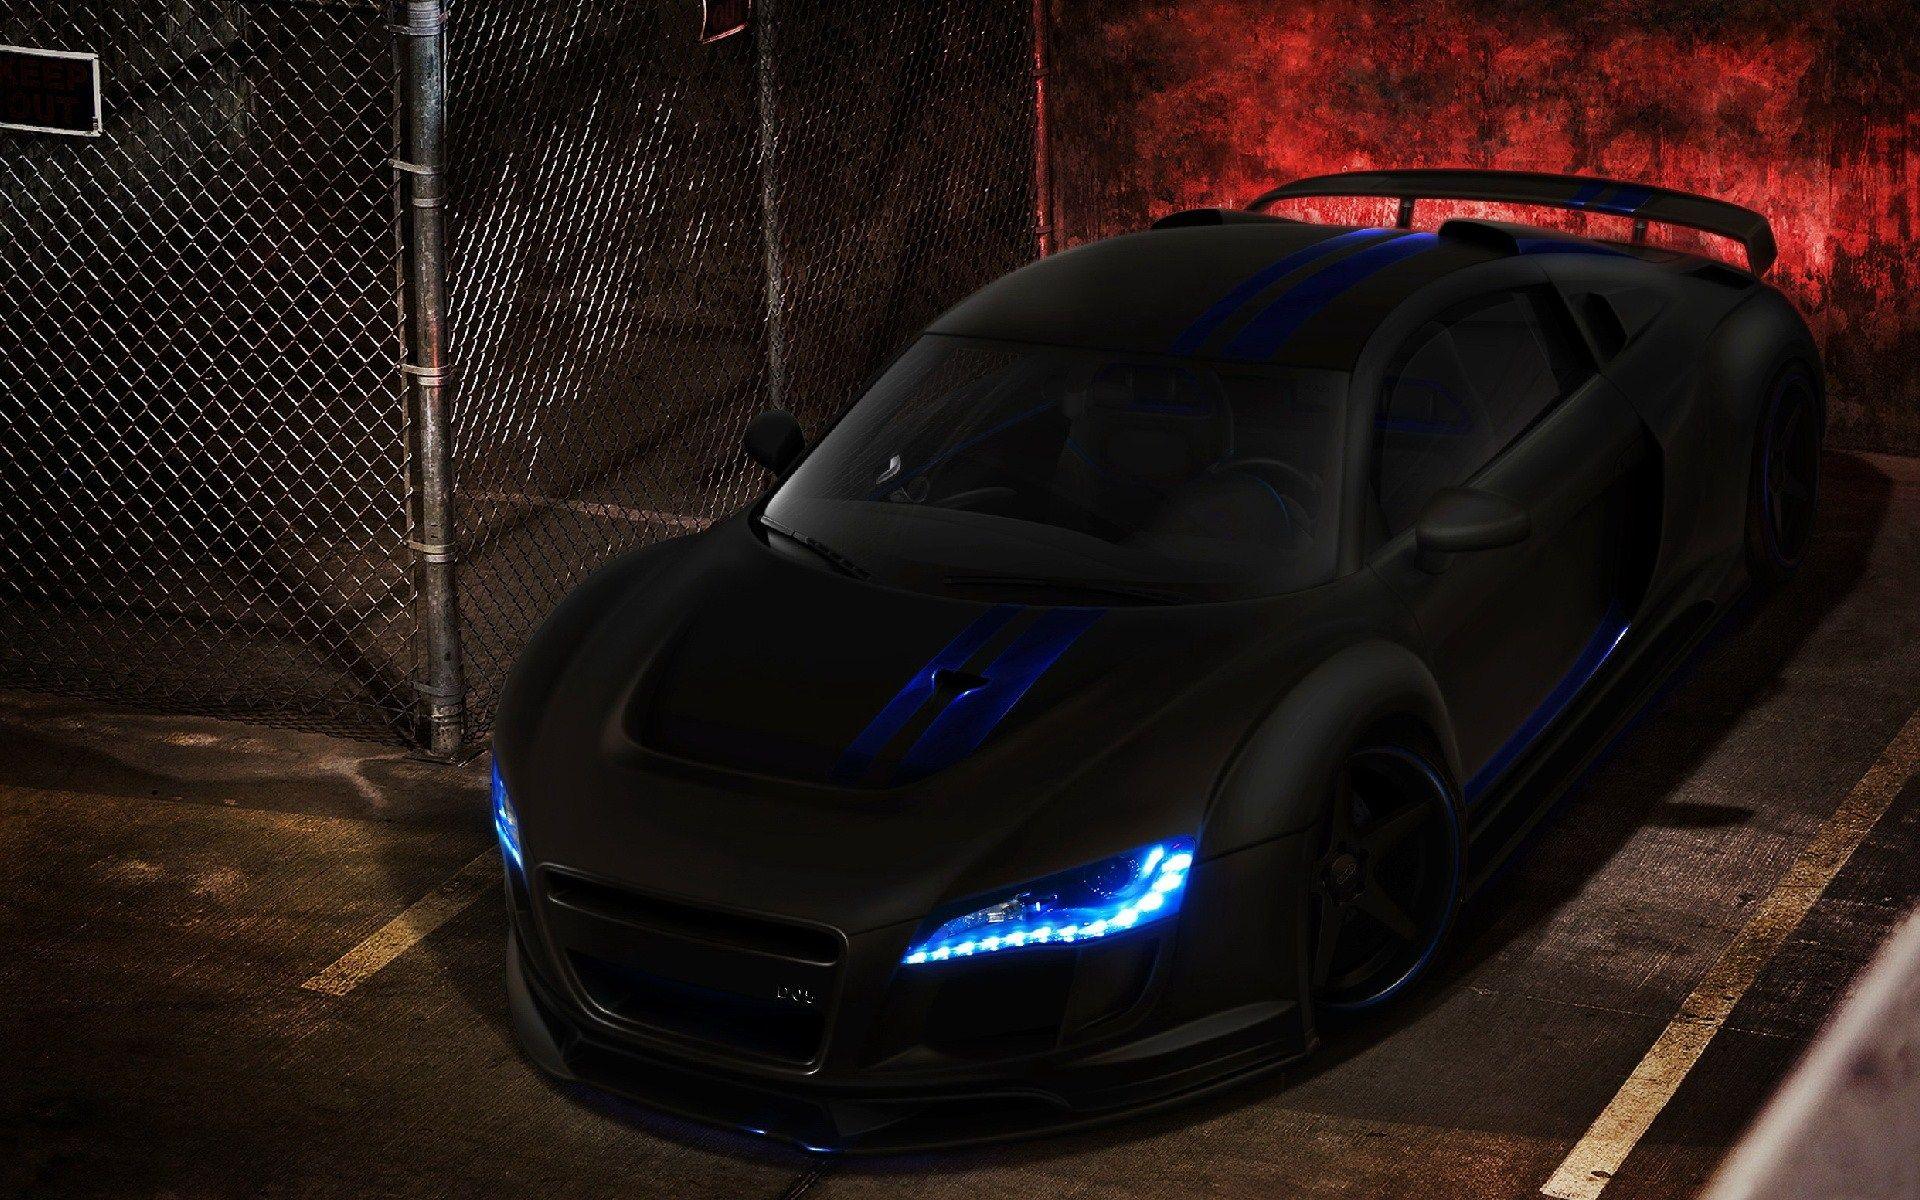 50 Super Sports Car Wallpapers That Ll Blow Your Desktop Away Black Audi Audi R8 Black Audi R8 Wallpaper